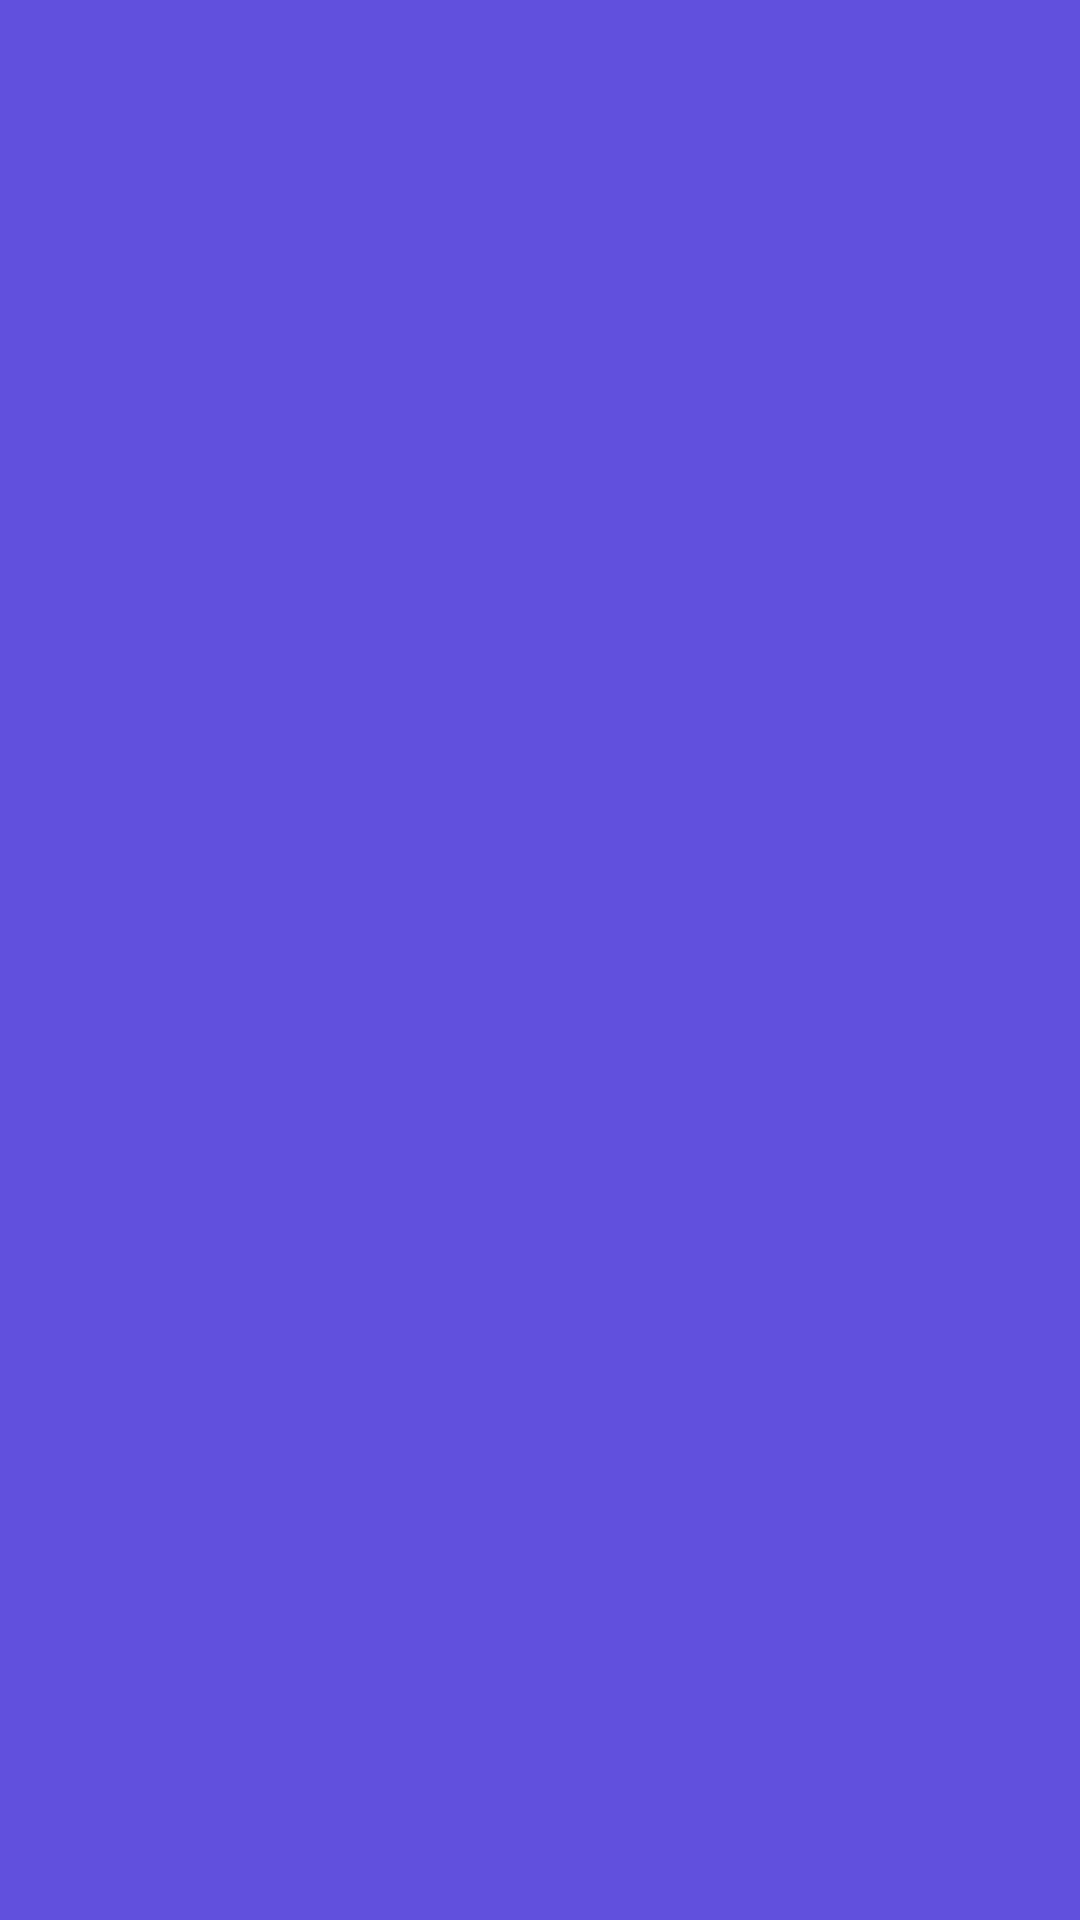 1080x1920 Majorelle Blue Solid Color Background